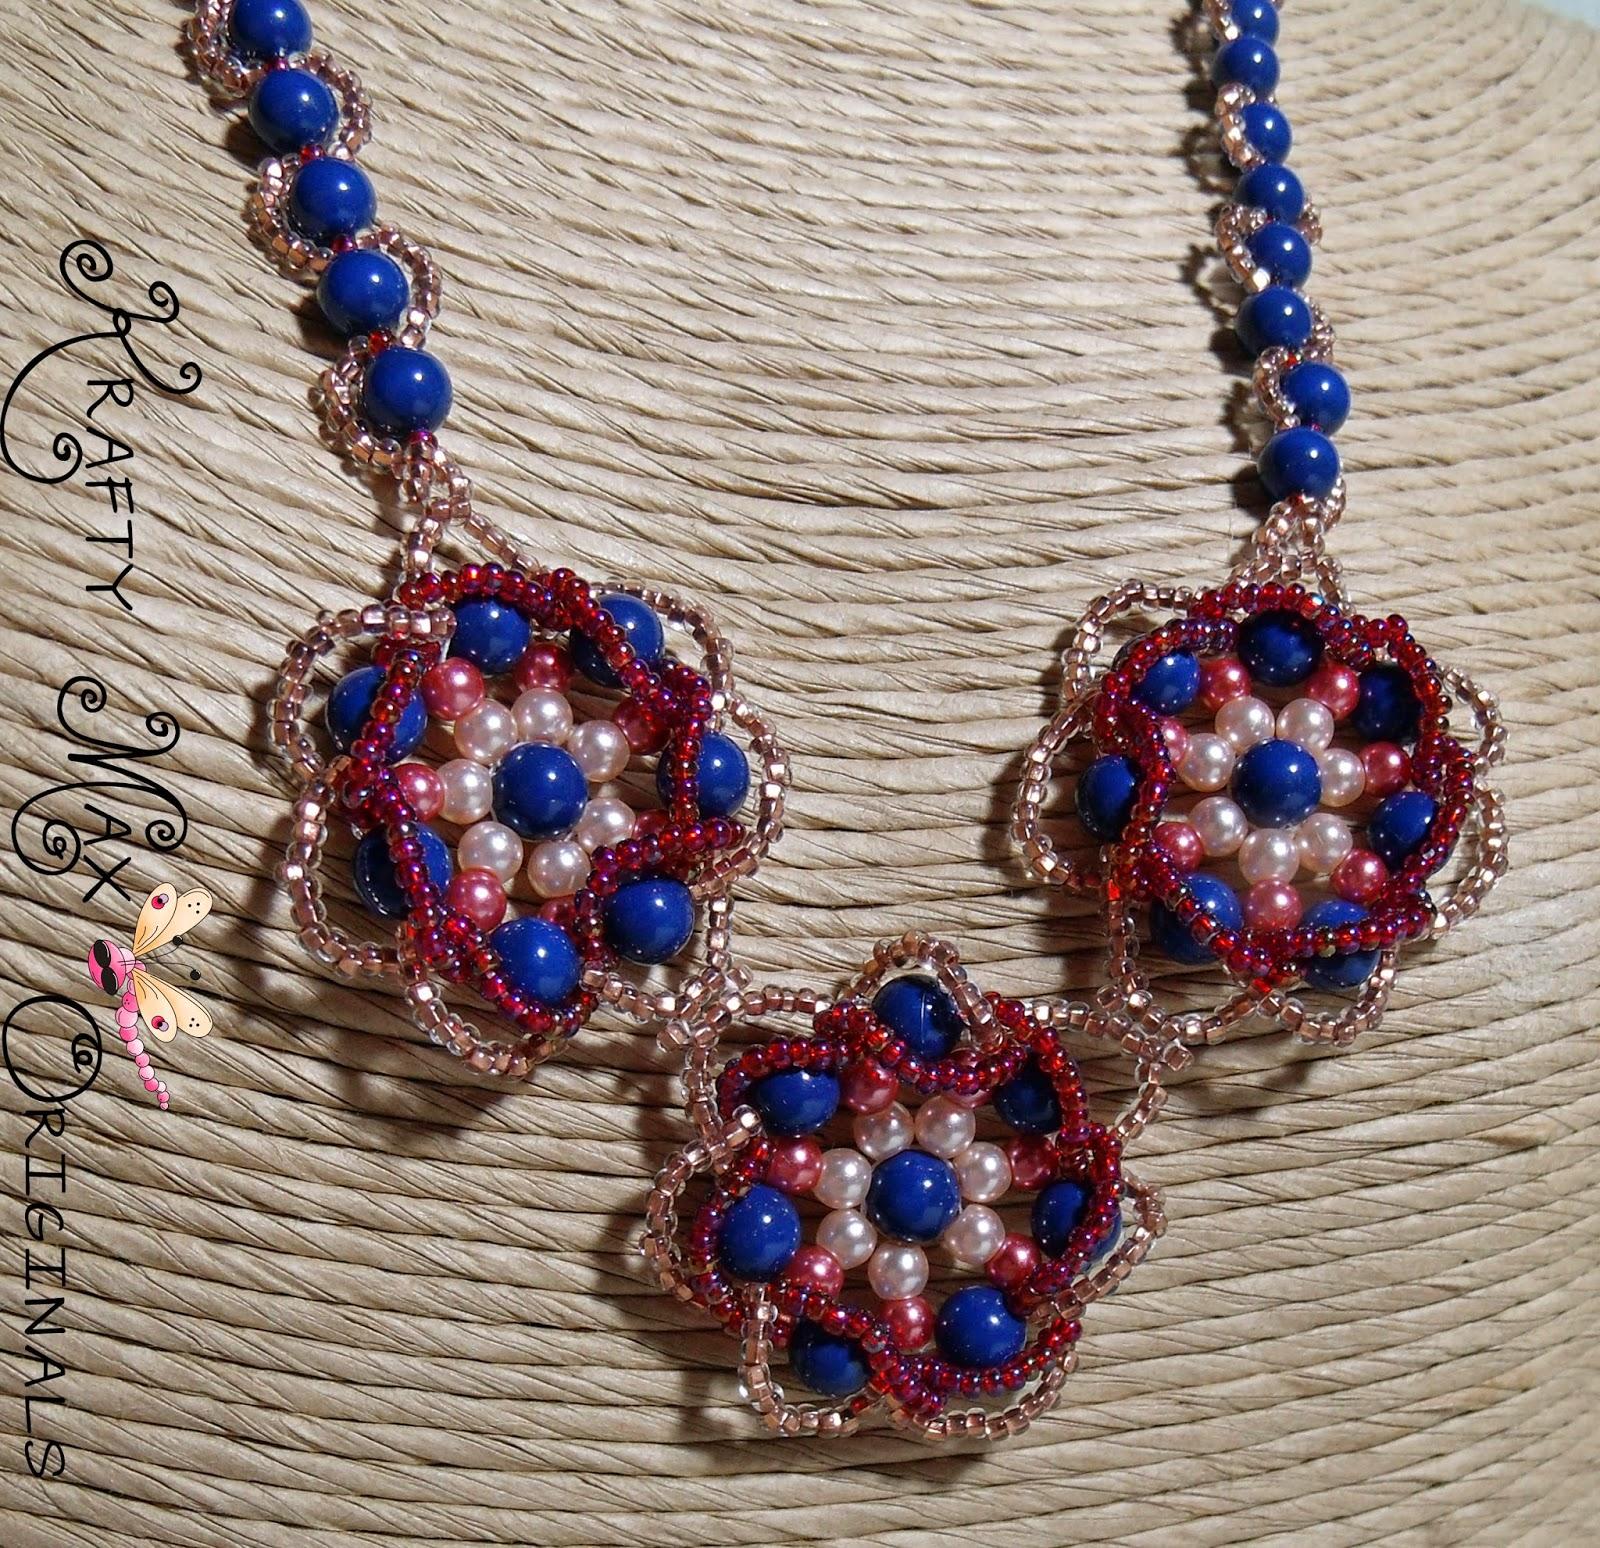 http://www.artfire.com/ext/shop/product_view/KraftyMax/9740780/blue_flowers_bursting_w_spring_swarovski_pearl_beadwoven_necklace_set/handmade/jewelry/necklaces/beadwoven